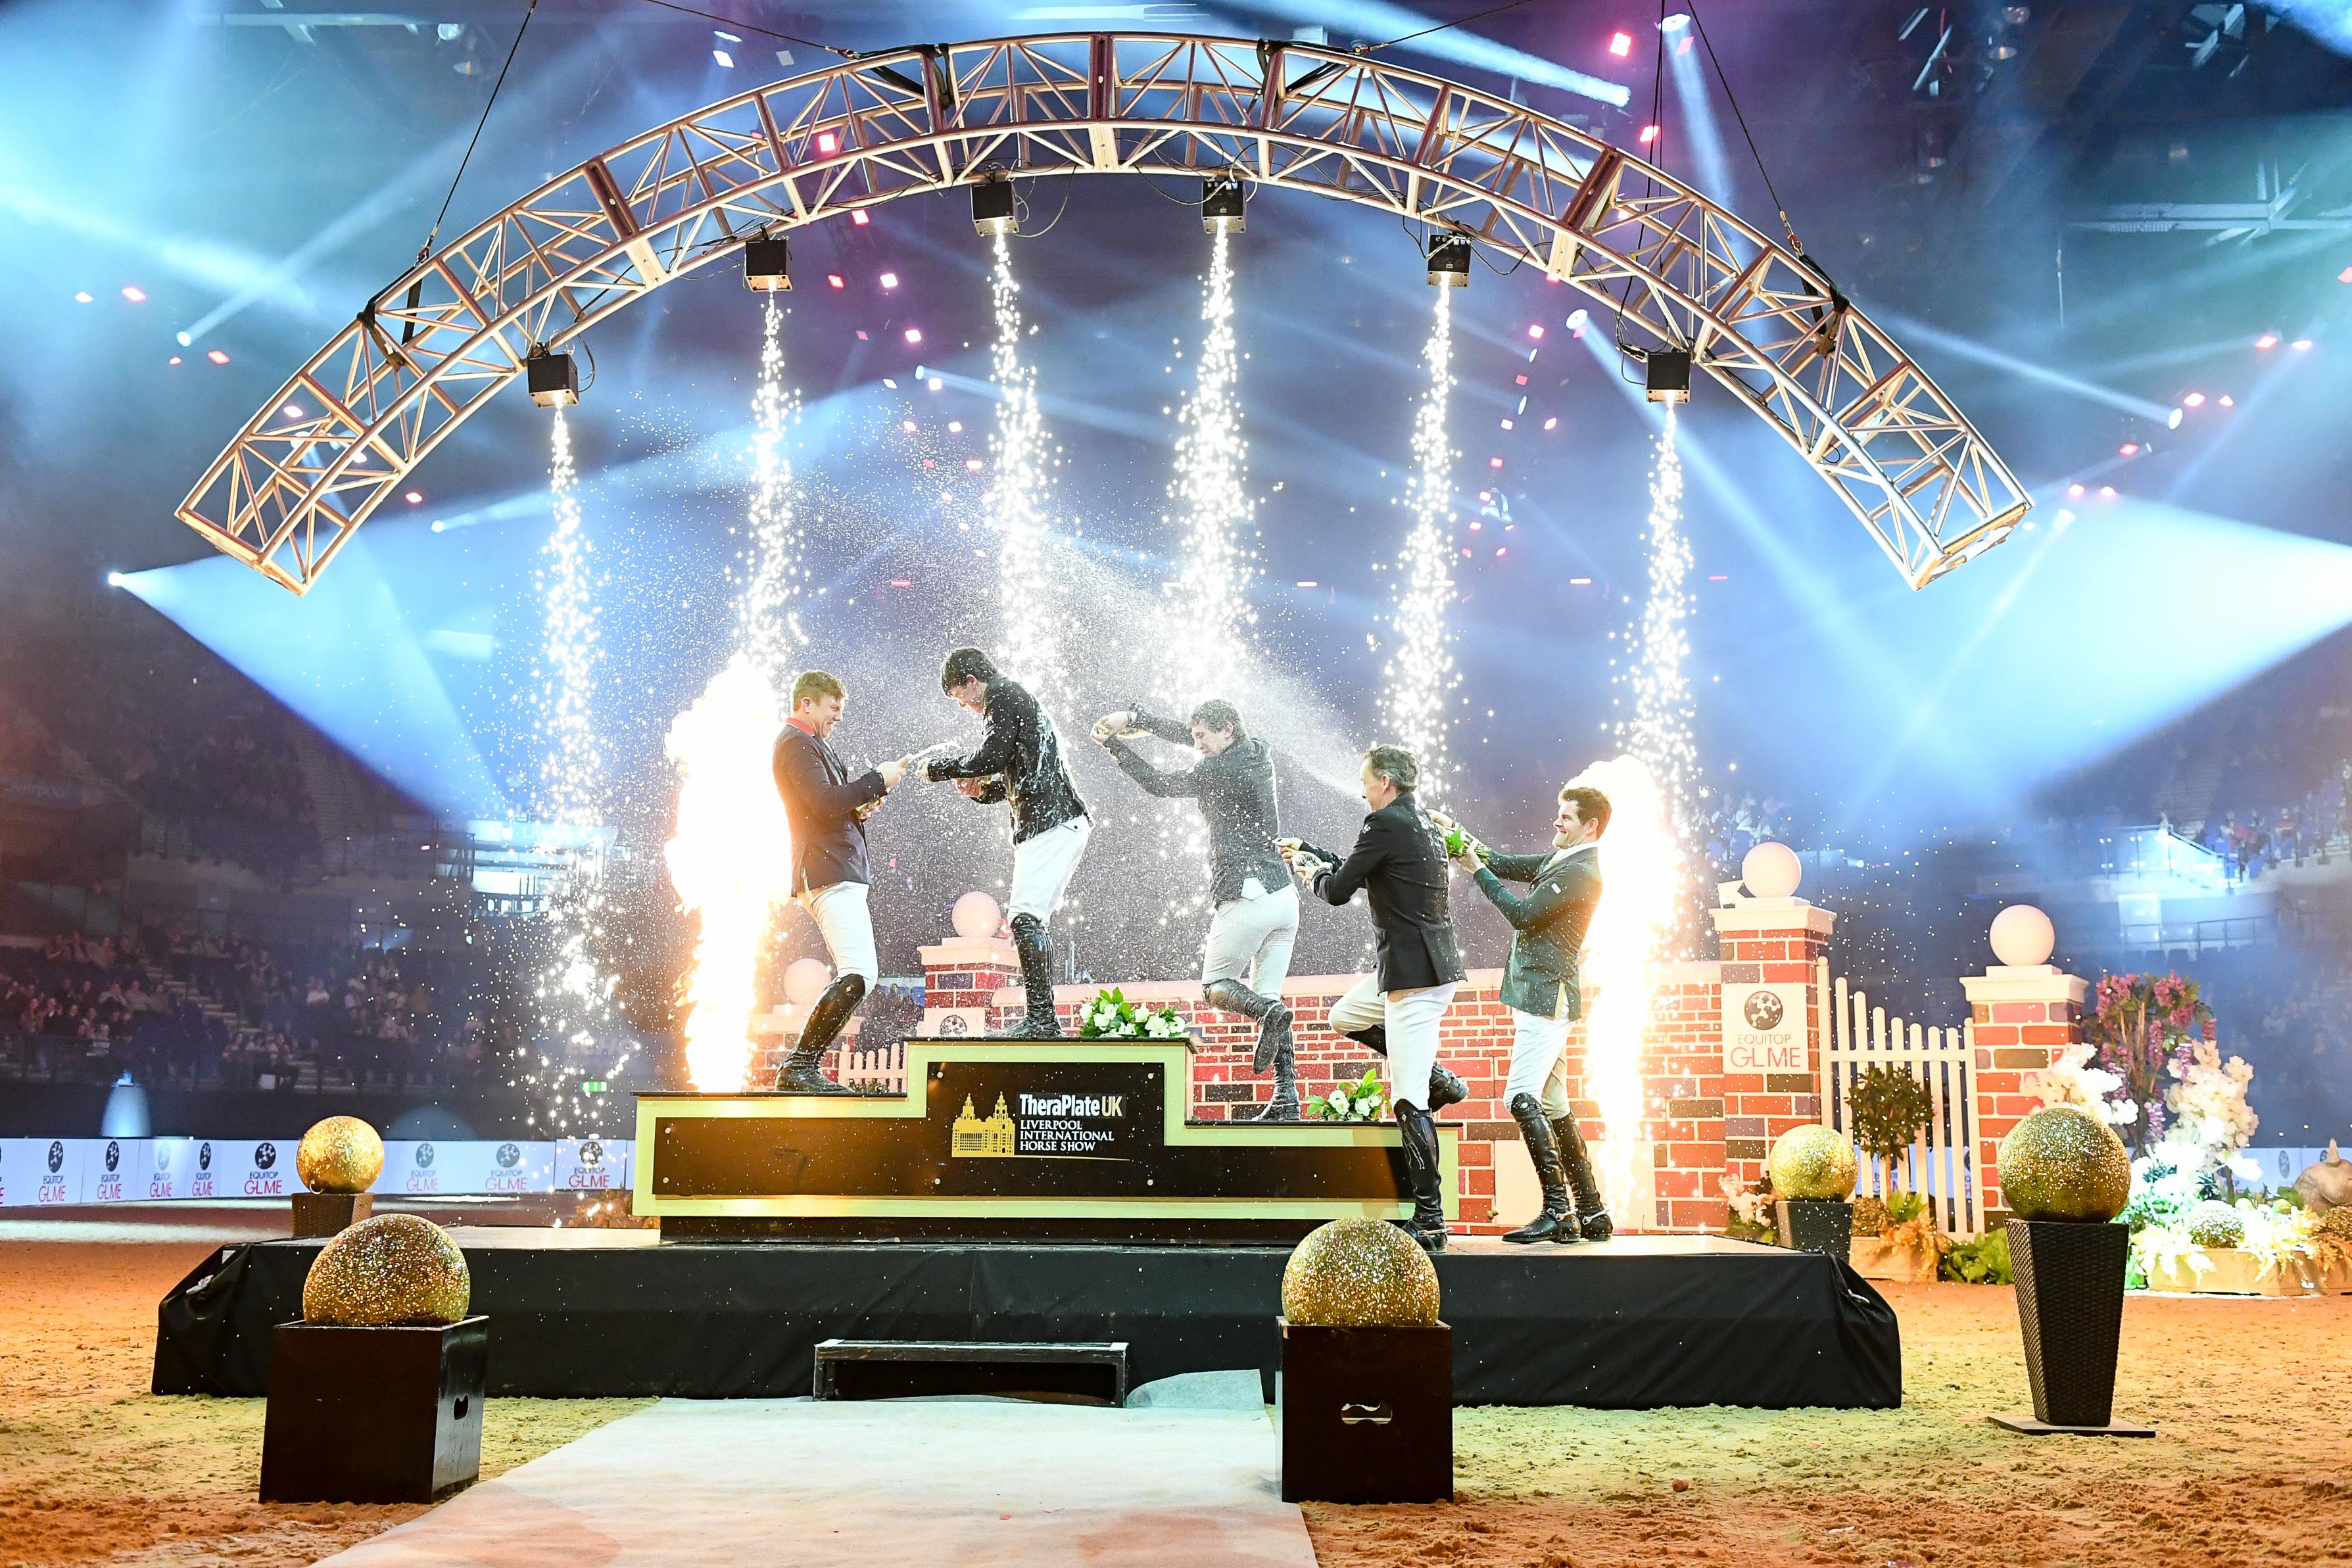 liverpool horse show 2018